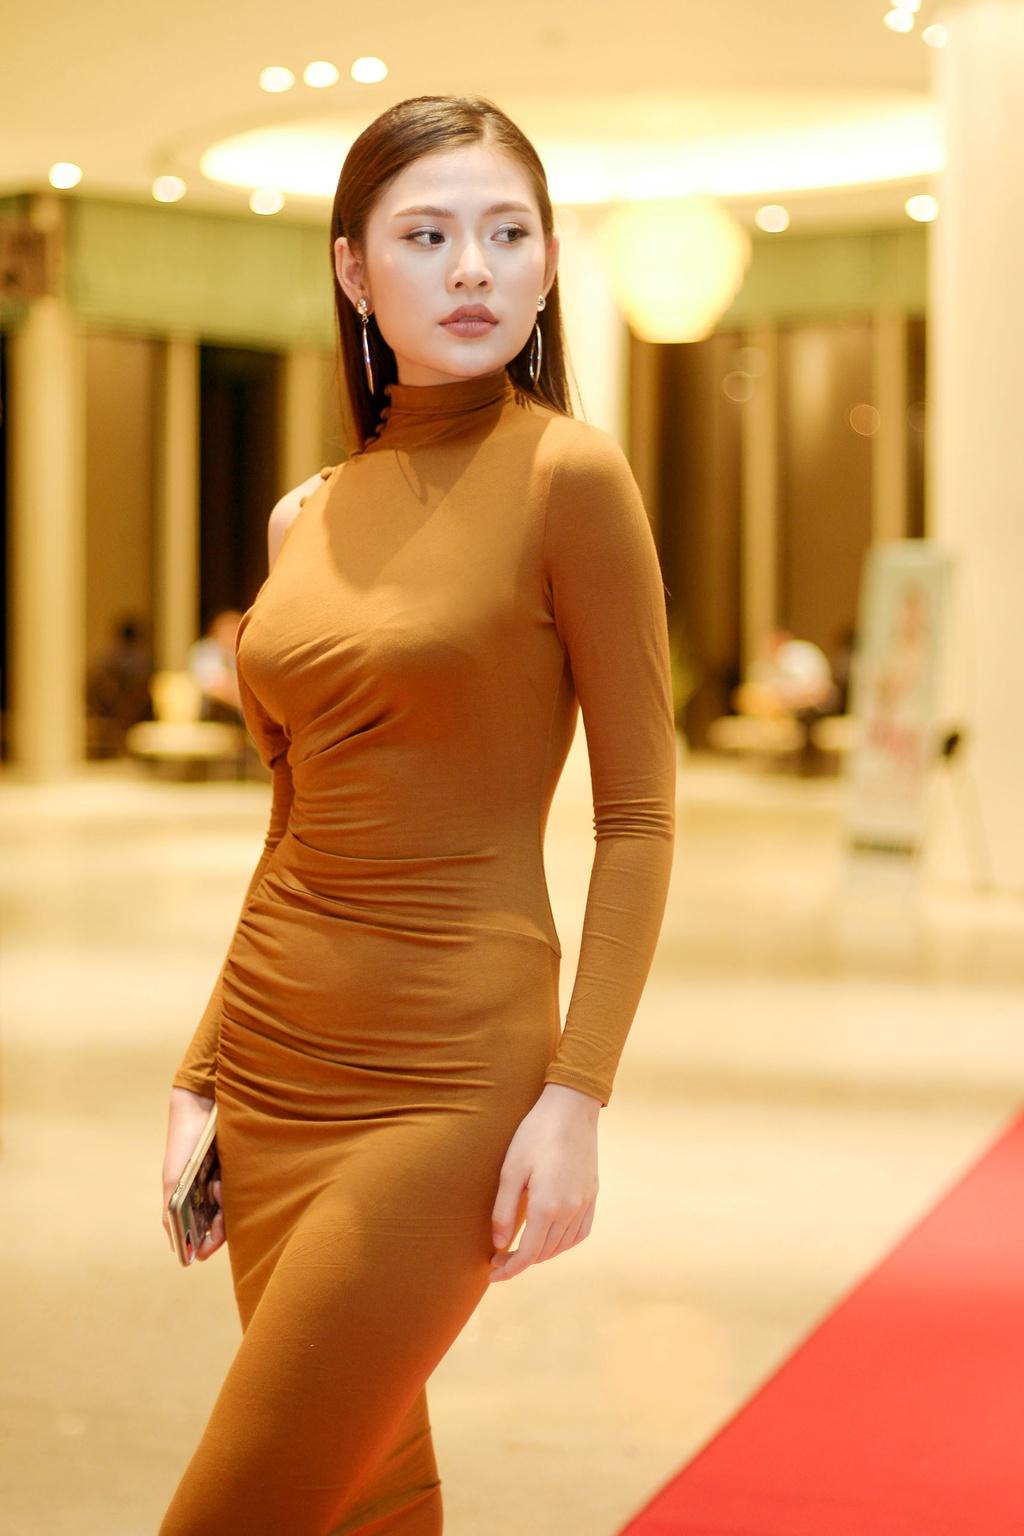 Pham Huong va hoc tro Khanh Ngan than thiet khi hoi ngo hinh anh 5